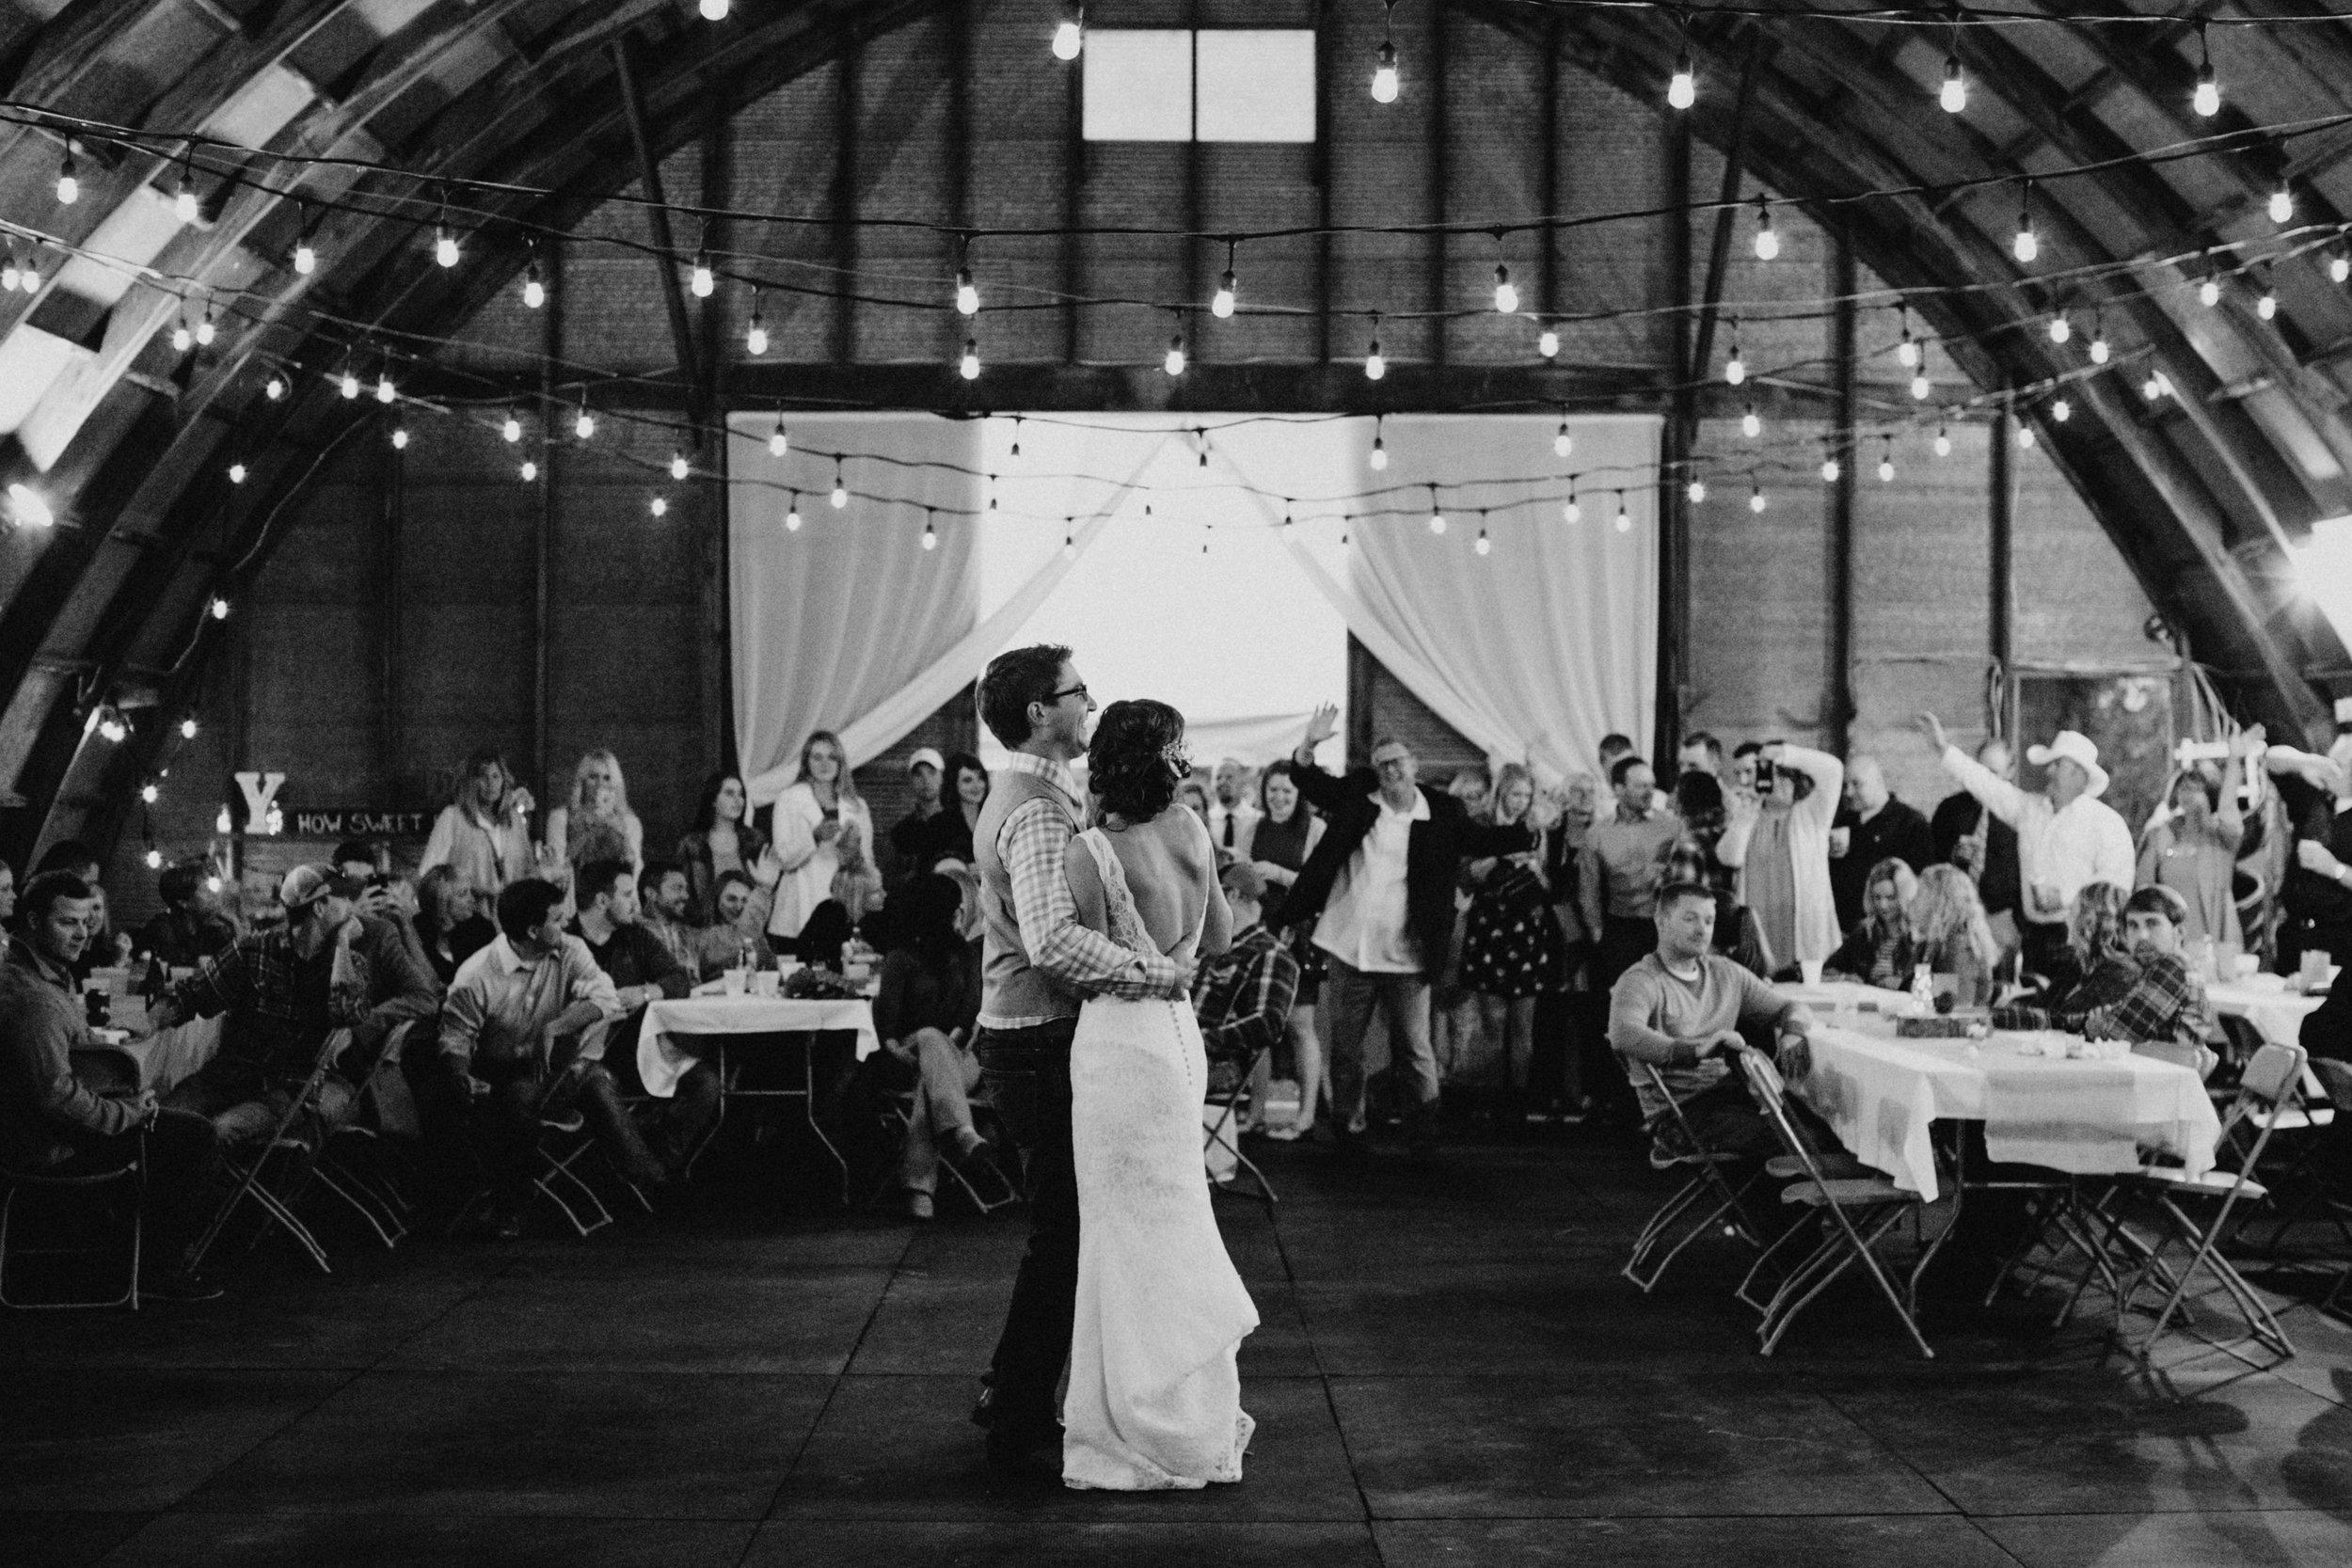 Rustic chic barn wedding reception in Brainerd MN